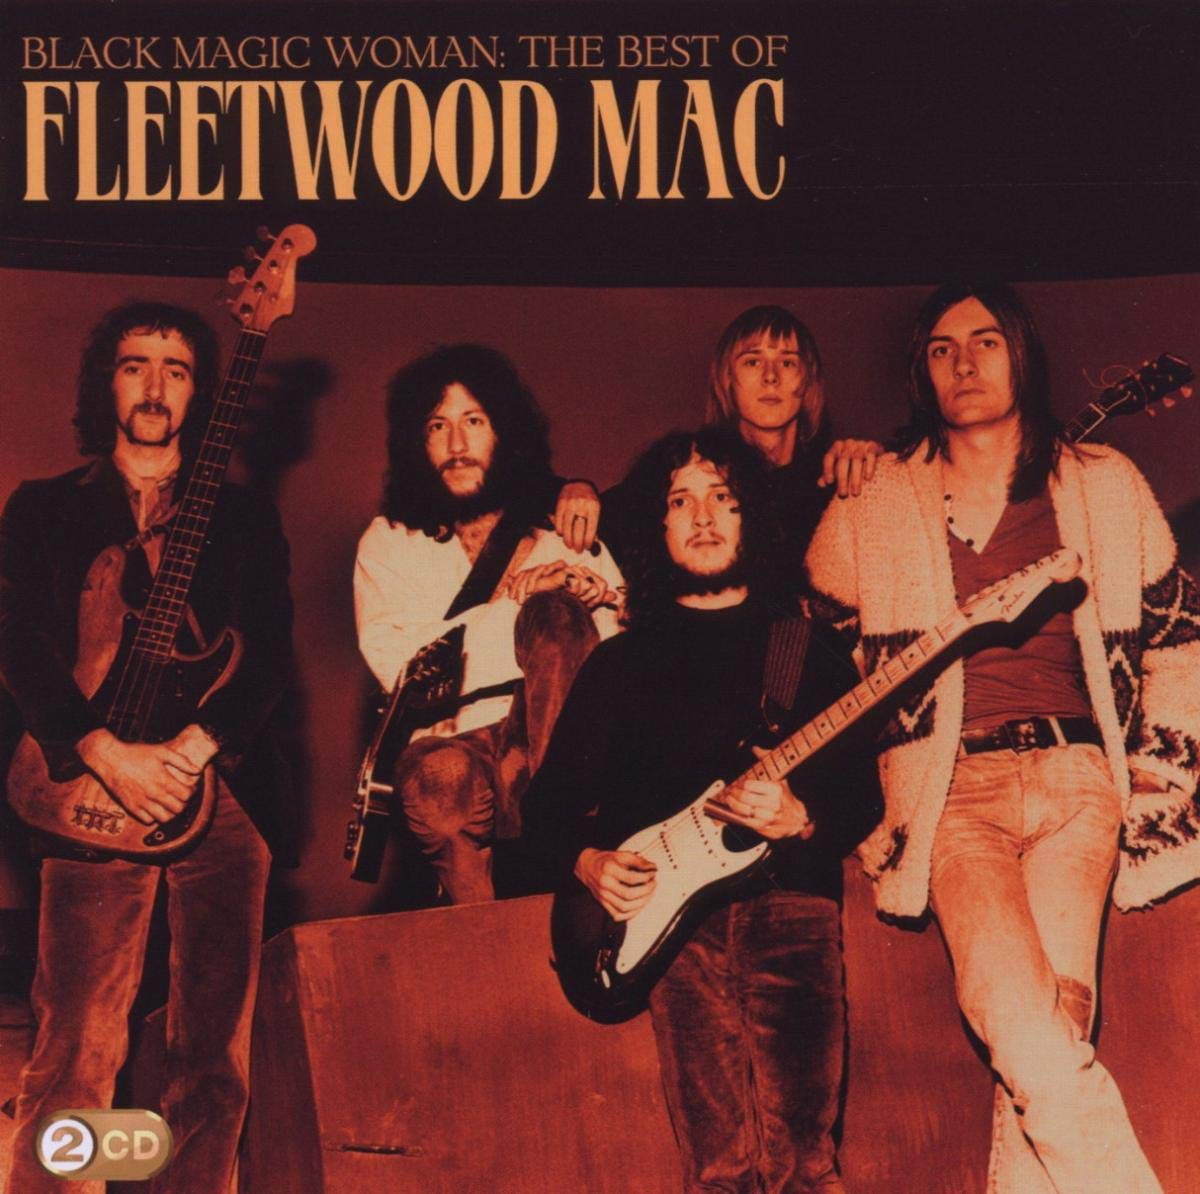 Fleetwood Mac - Black Magic Woman: The Best Of Fleetwood Mac (2009) [FLAC] Download